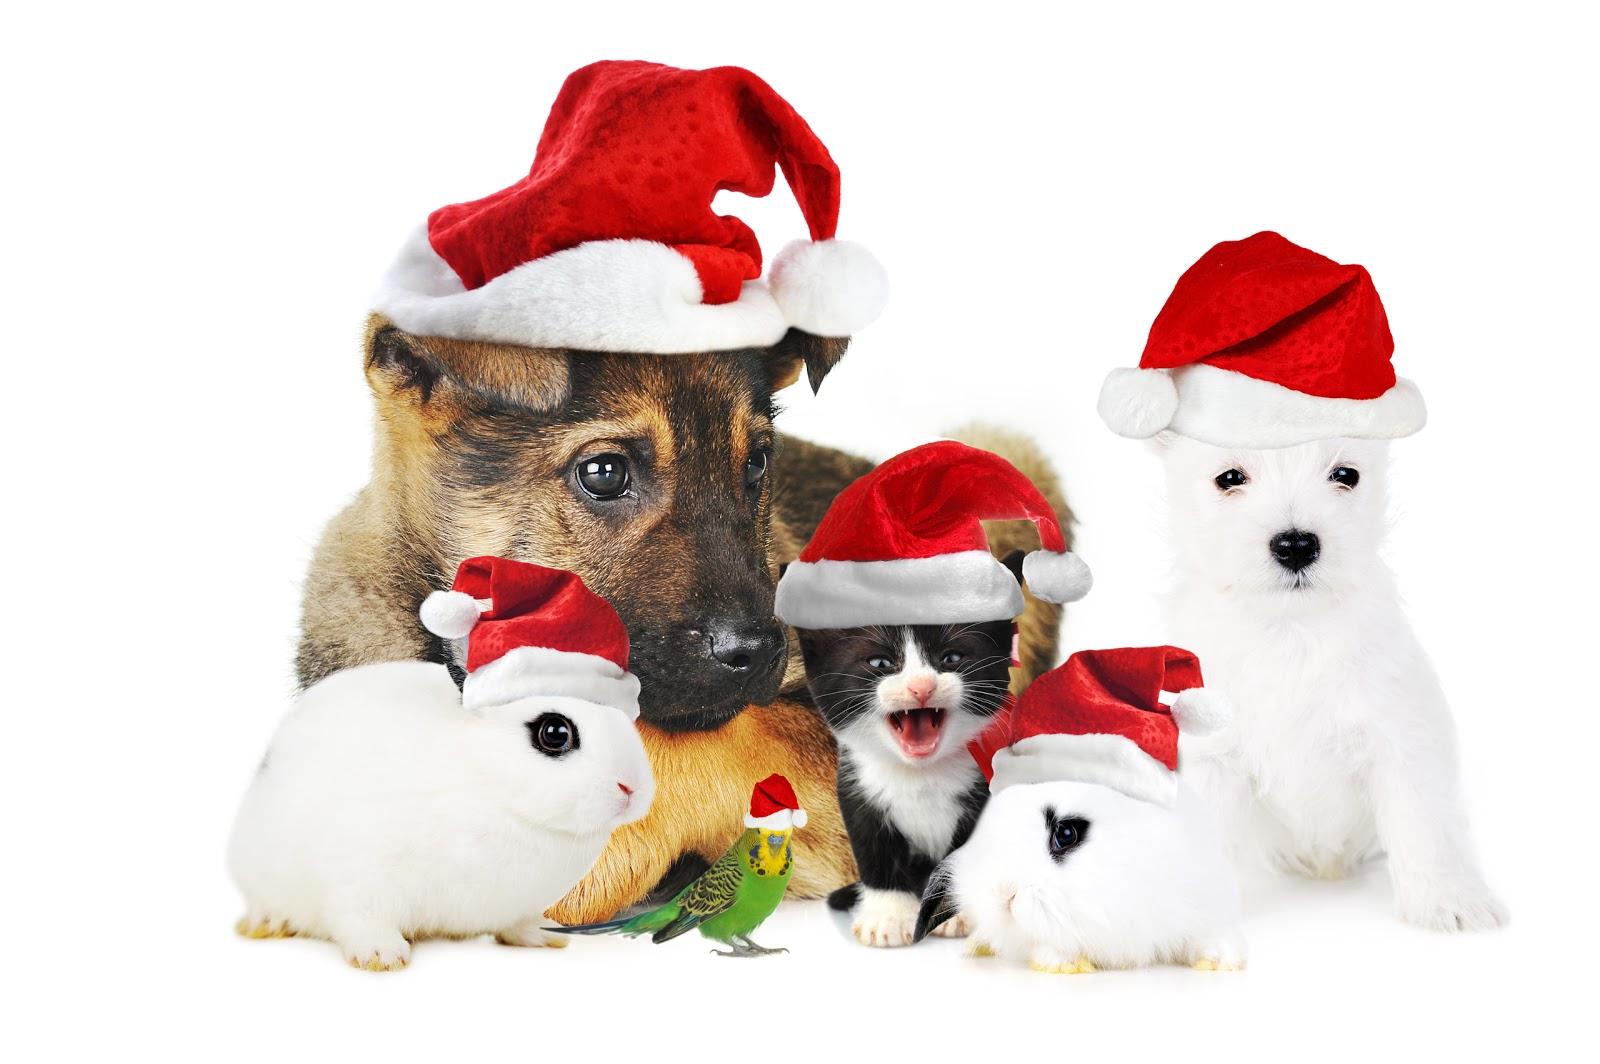 Christmas Animals 2012